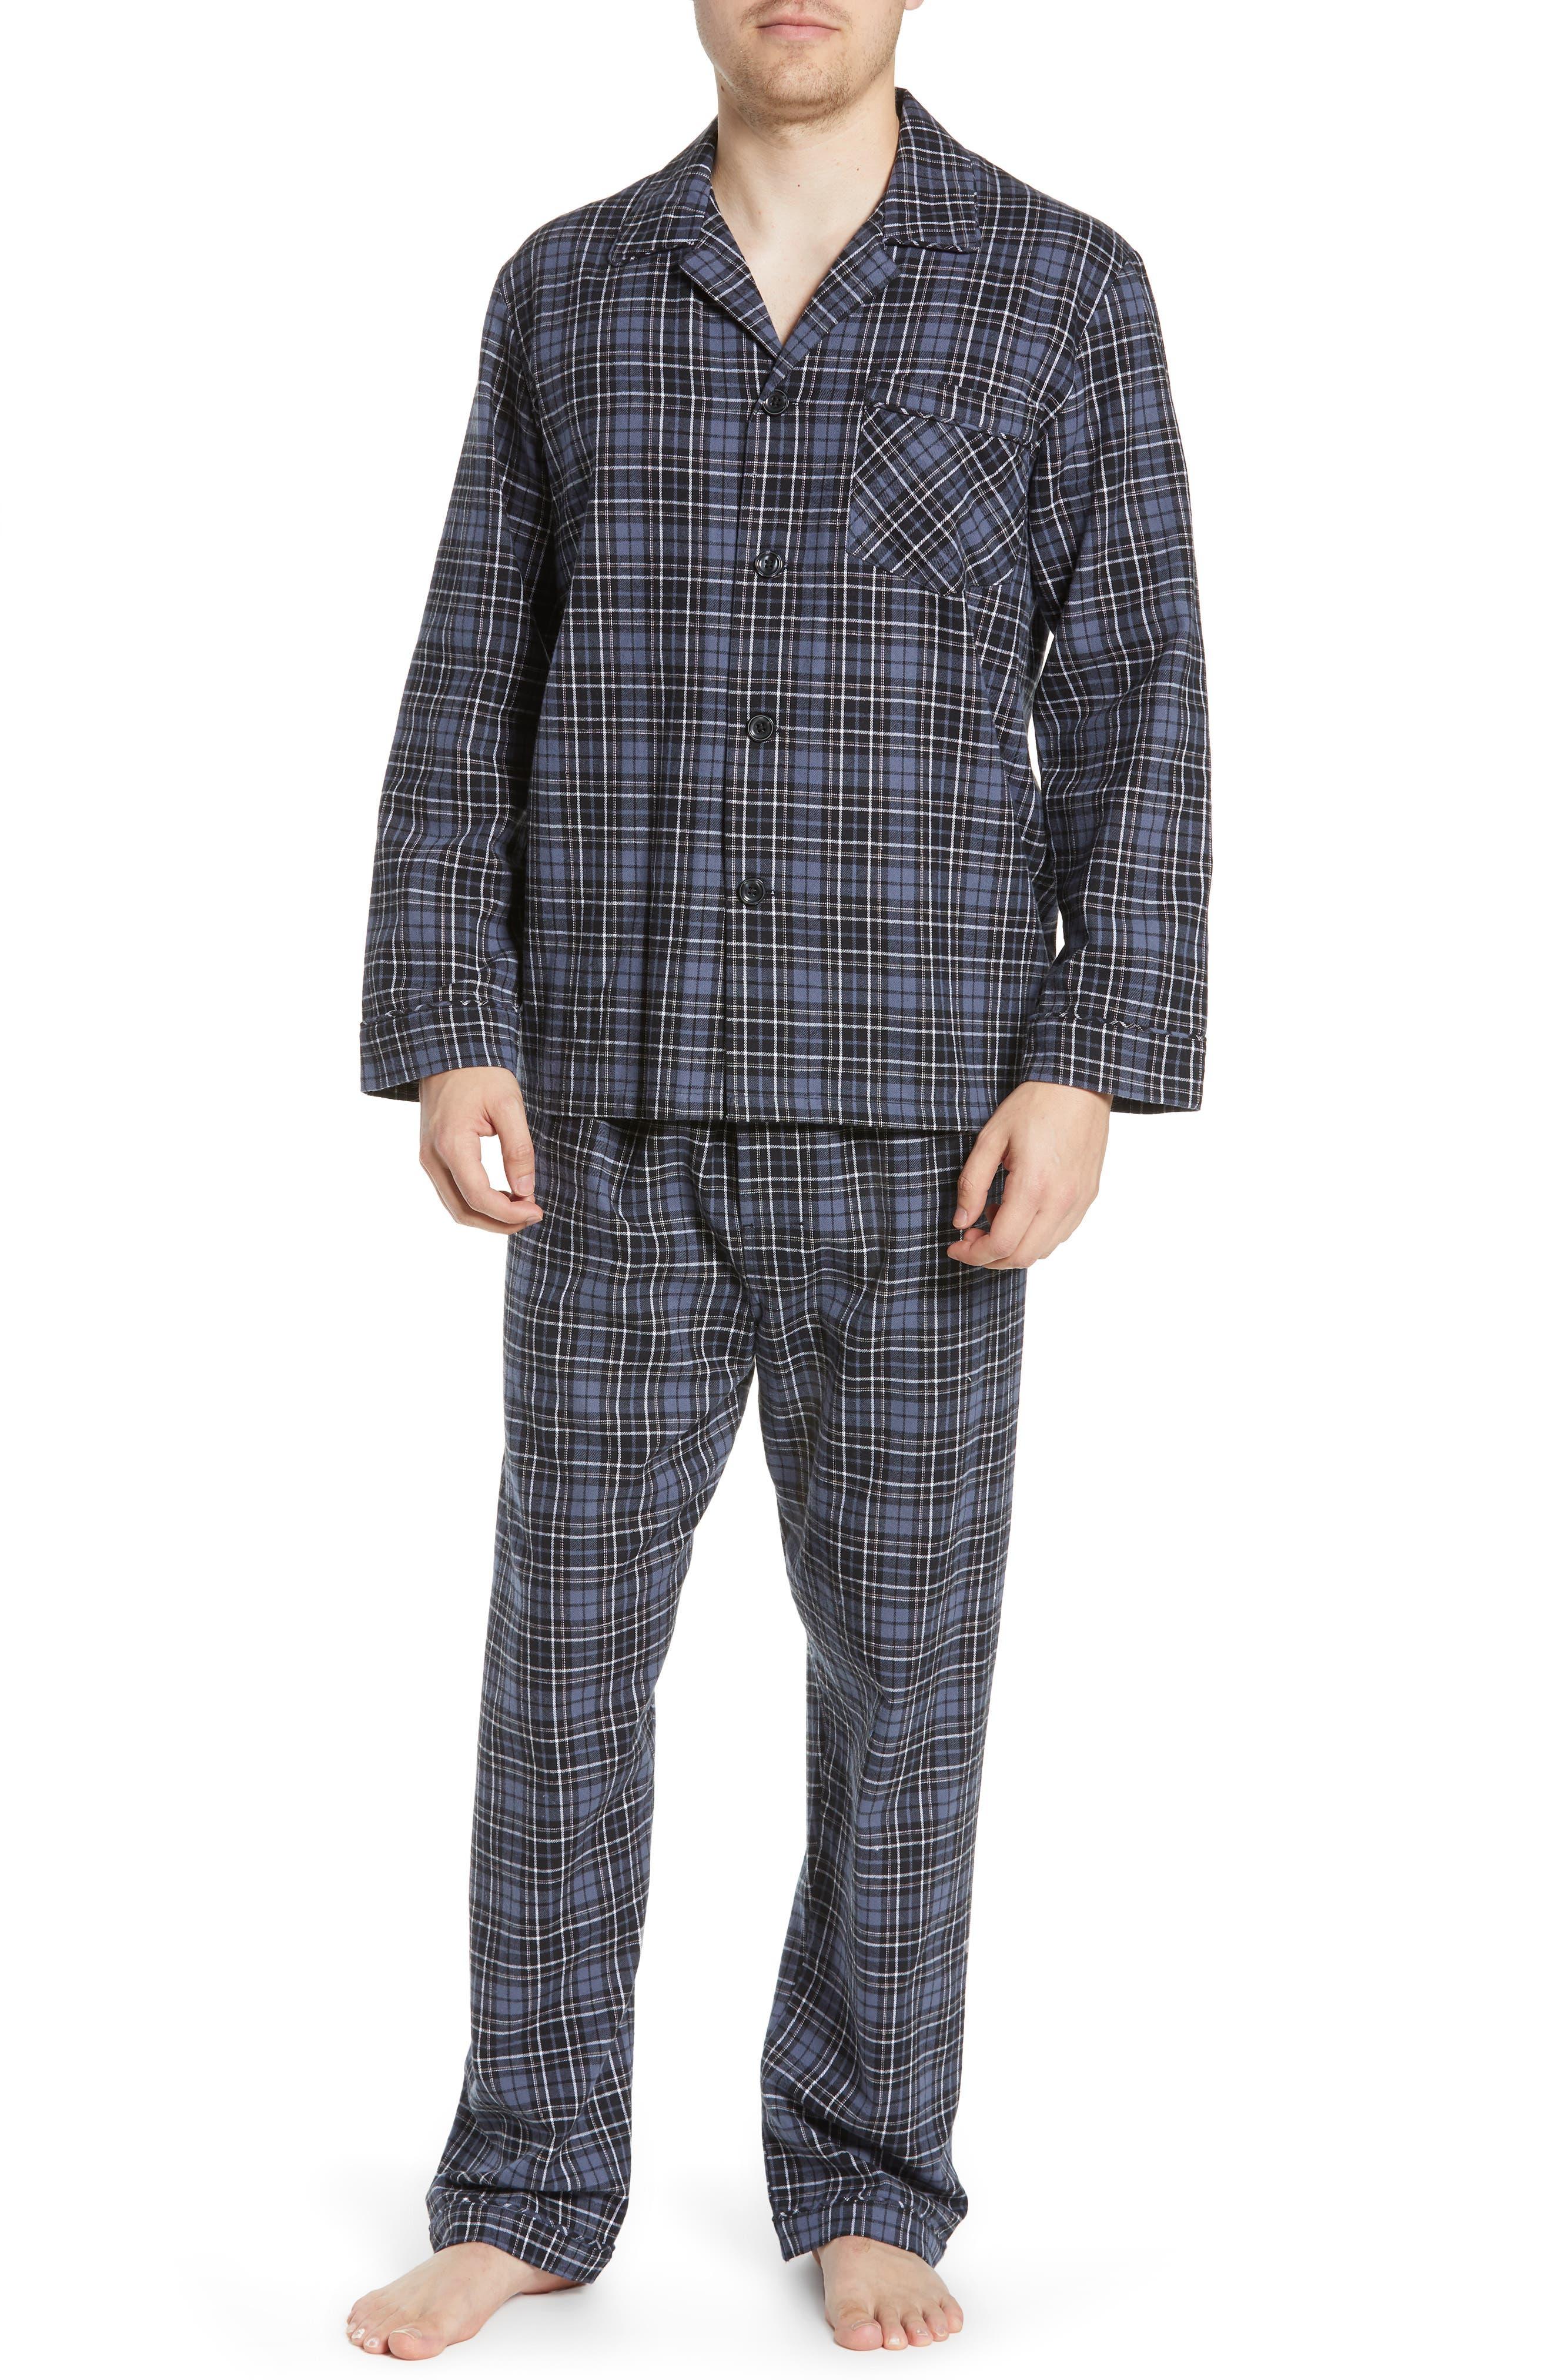 MAJESTIC INTERNATIONAL, True Match Flannel Pajamas, Main thumbnail 1, color, 001